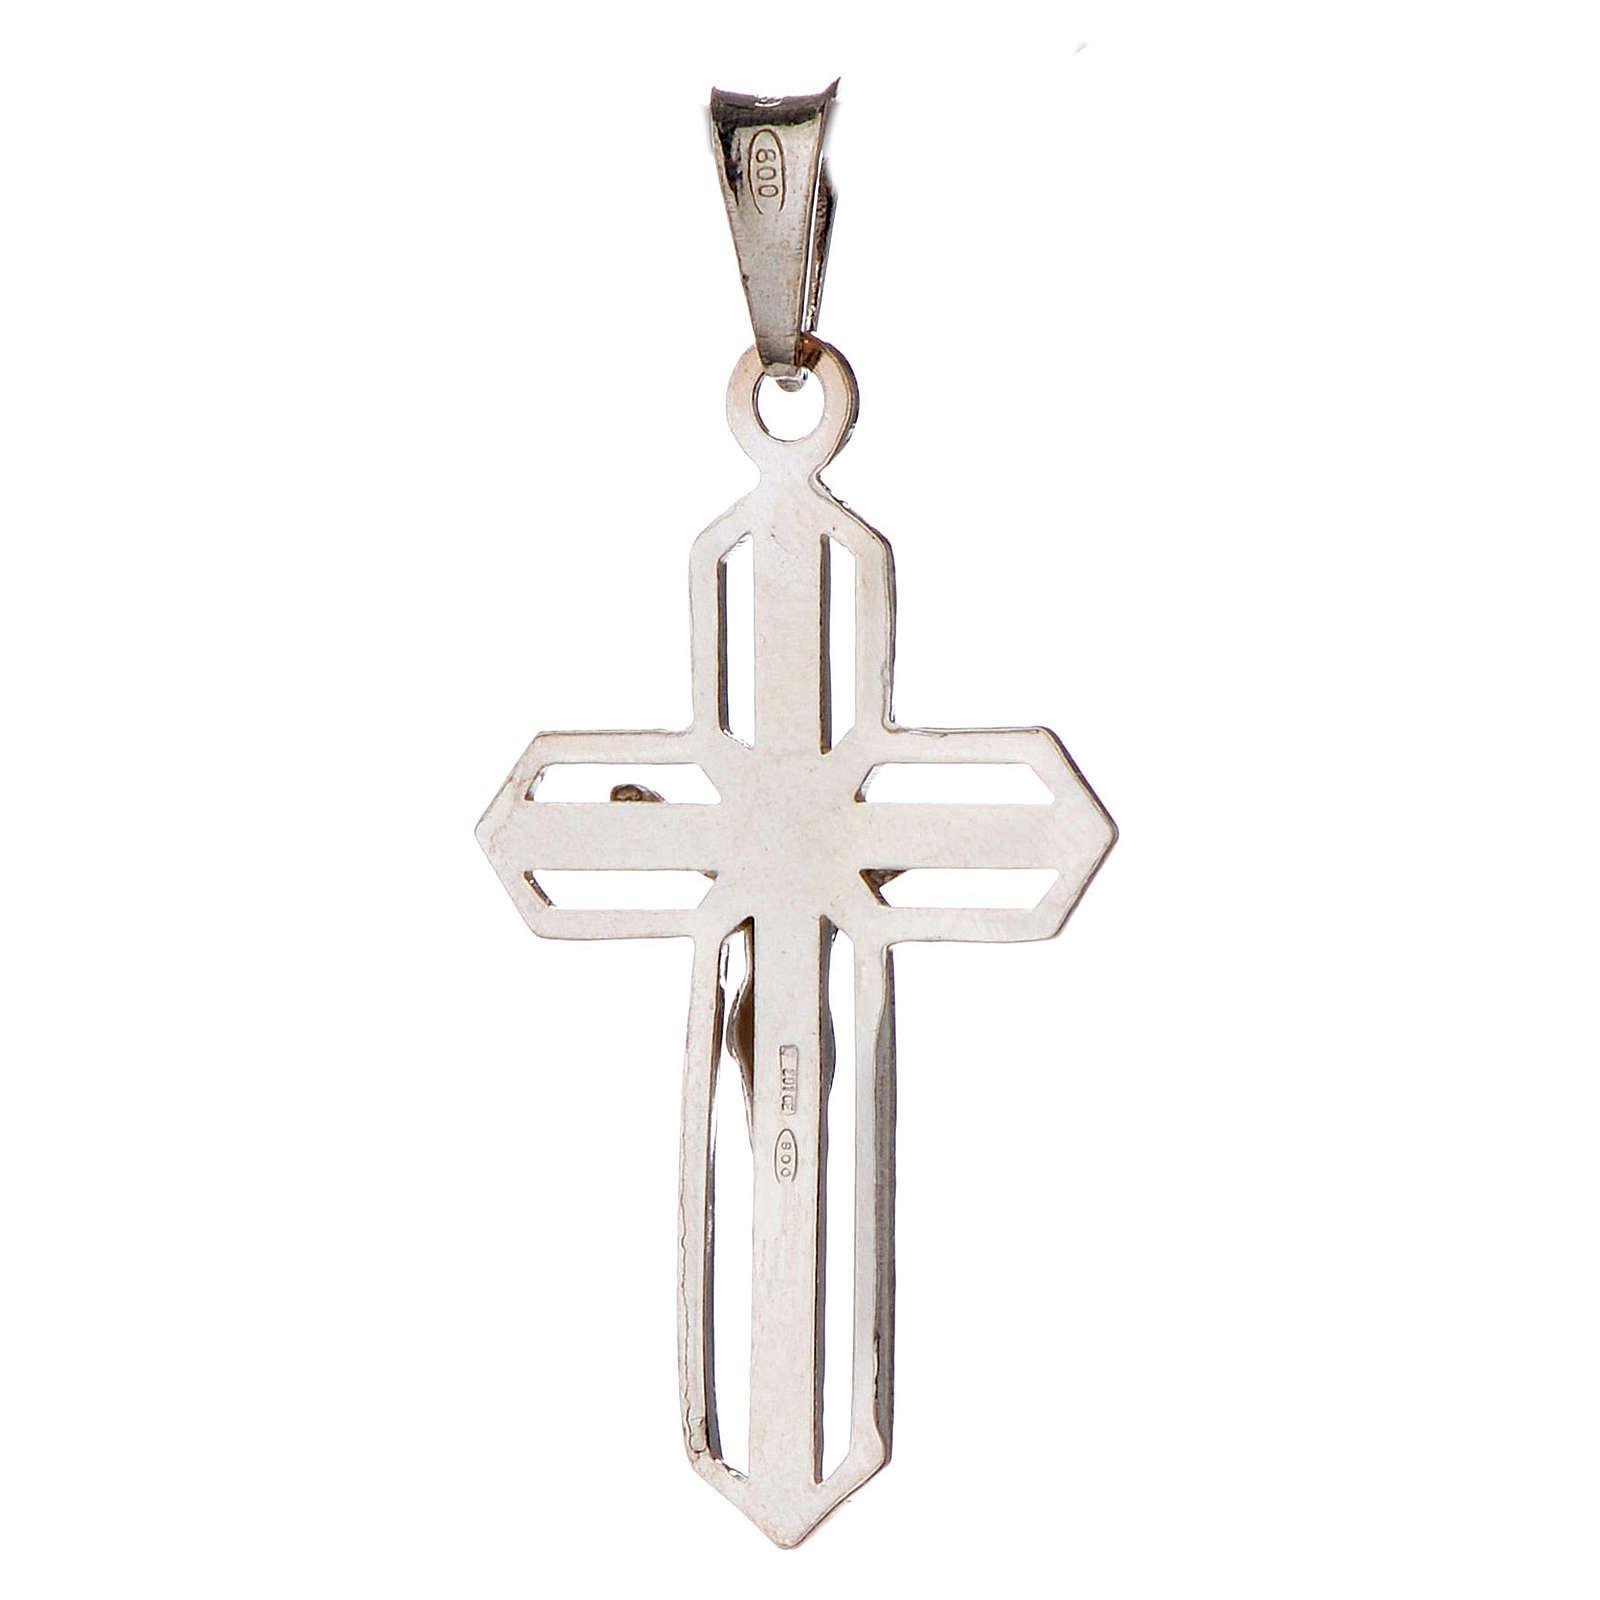 Ciondolo crocefisso argentato argento 925 4